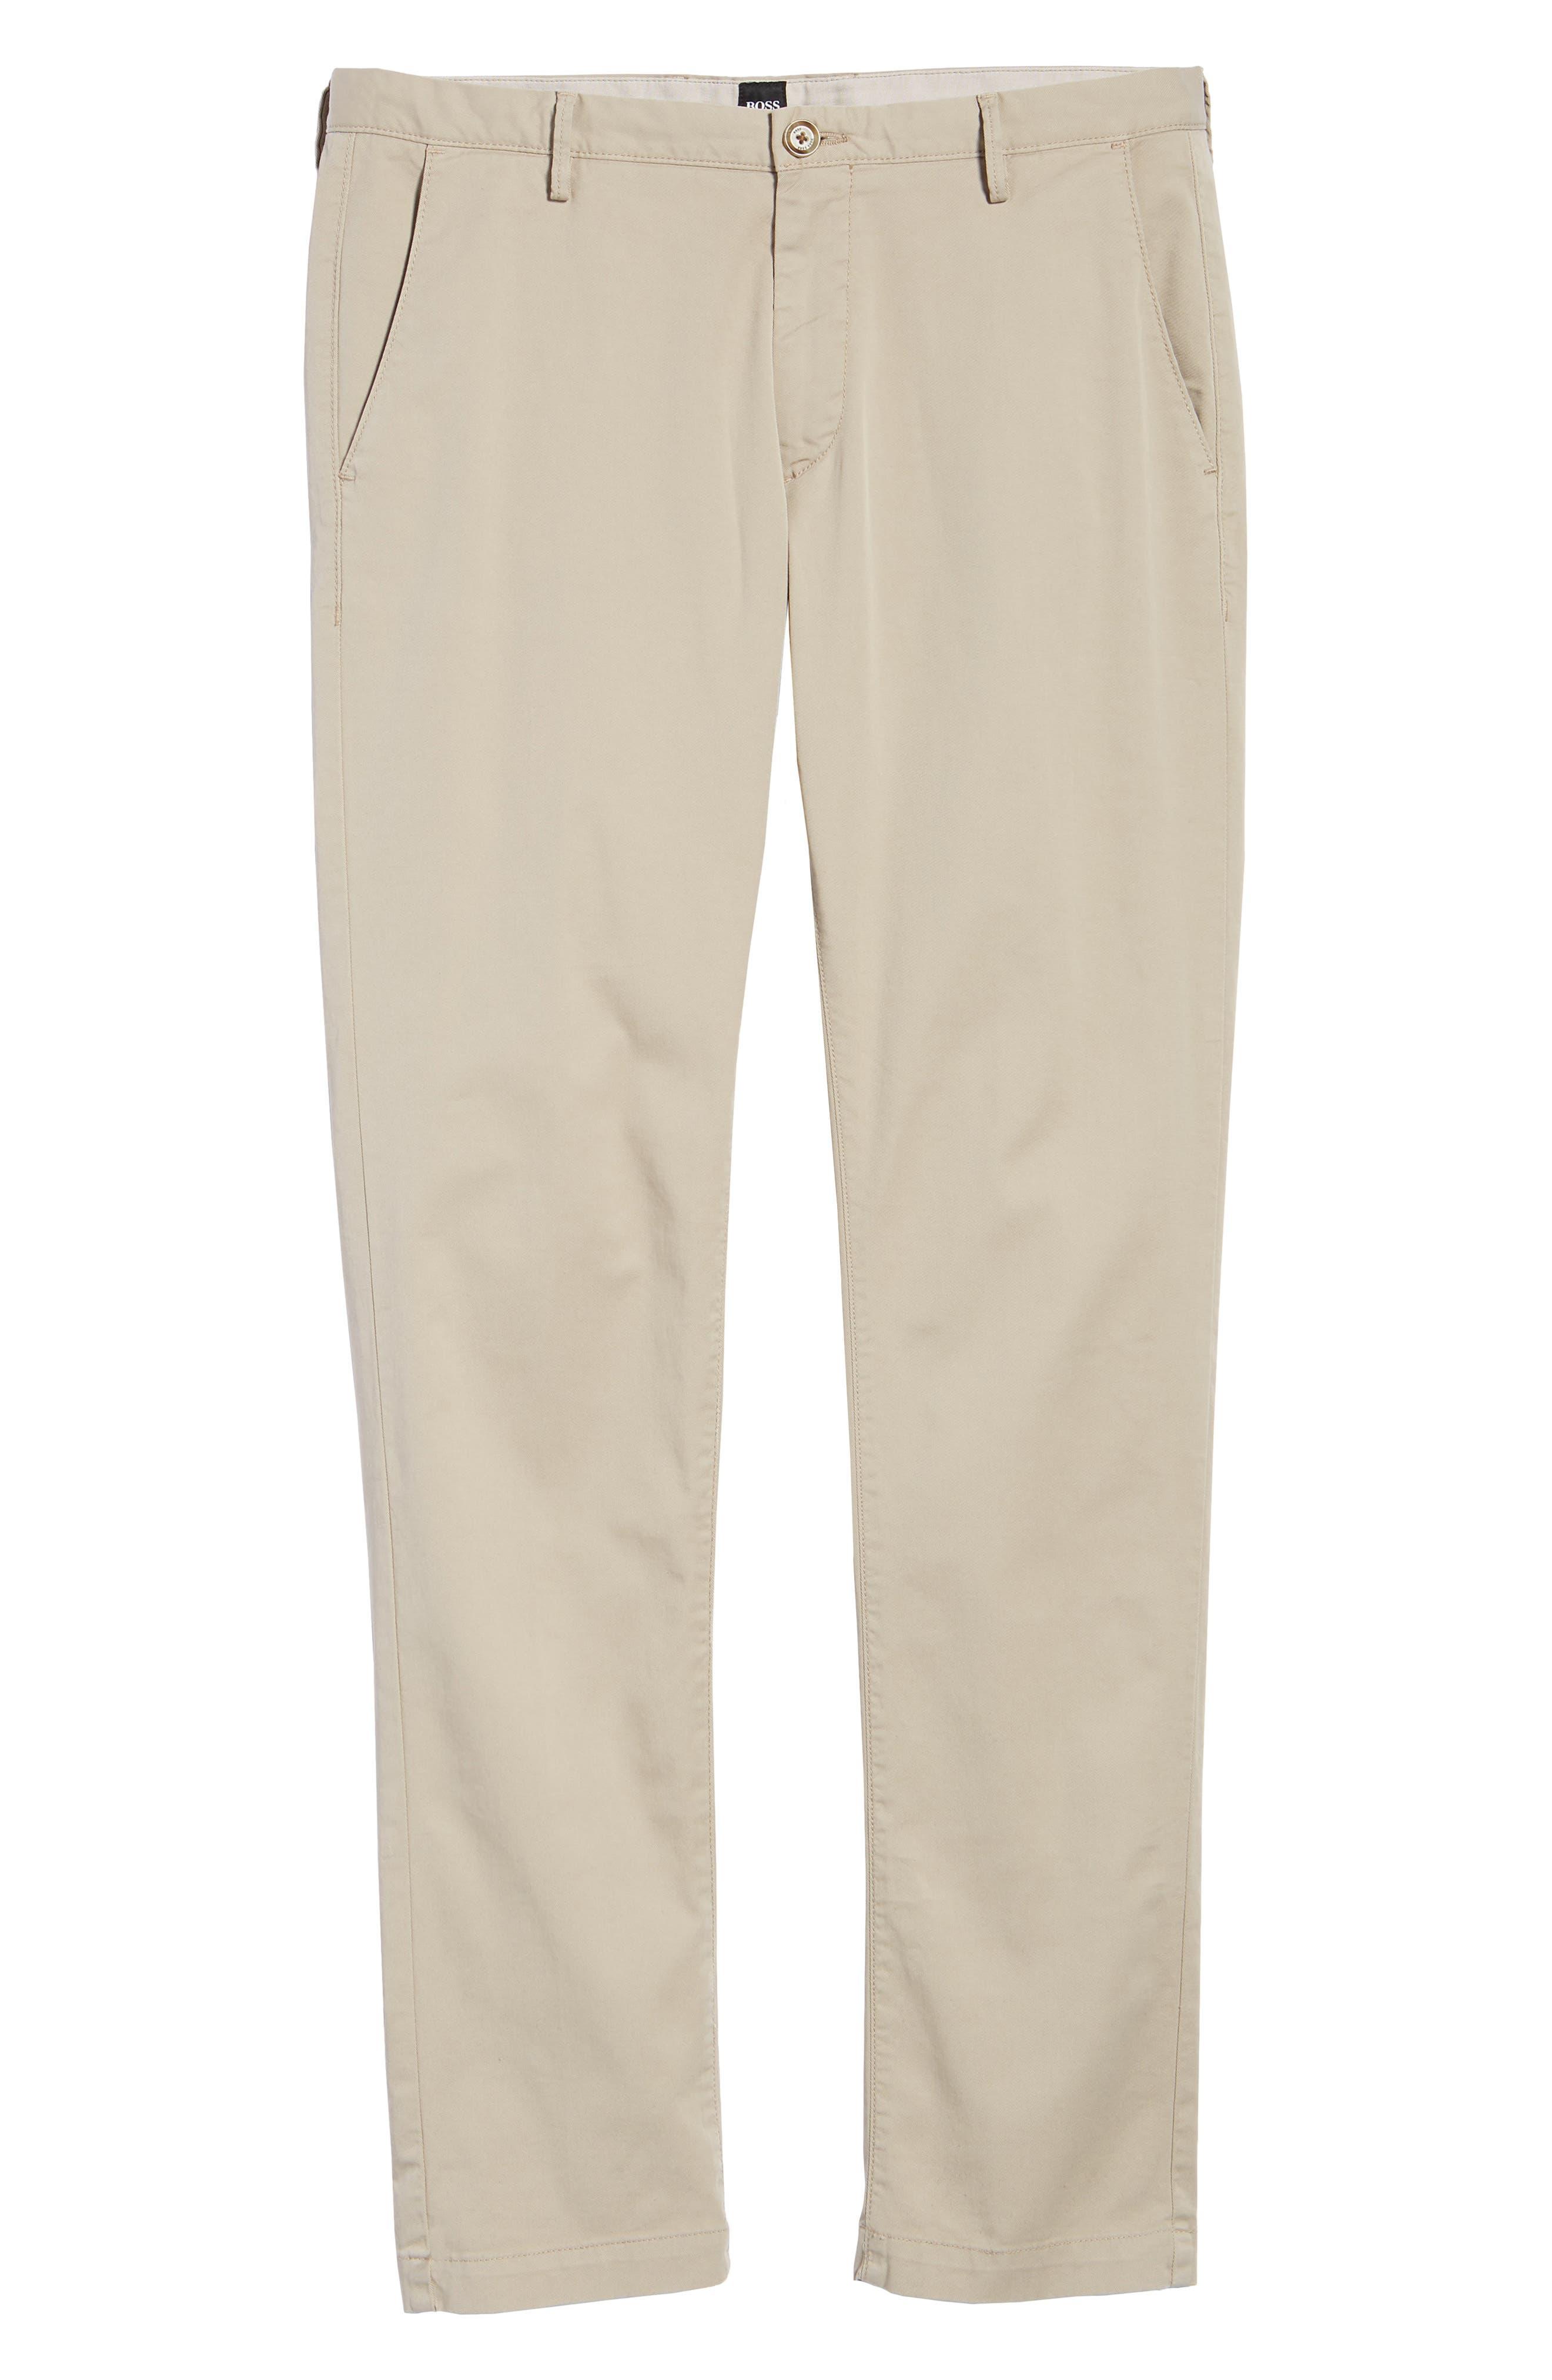 Rice Slim Fit Chino Pants,                             Alternate thumbnail 6, color,                             200